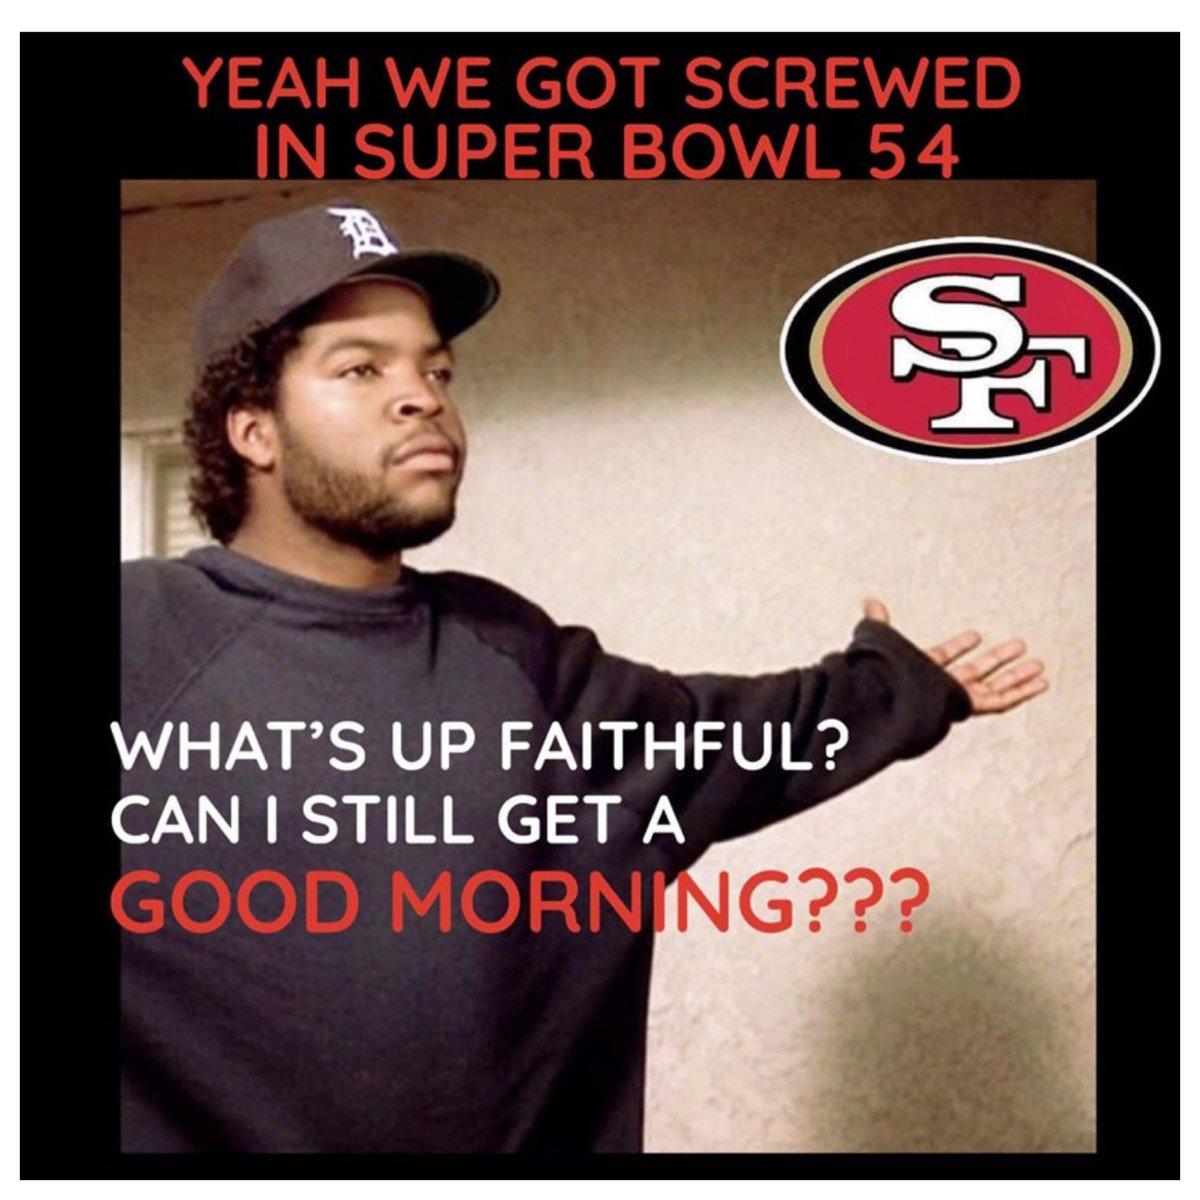 #nfl #football #superbowl  #sports #49ers #sanfrancisco #nflplayoffs #playoffs  #nfc   #red #gold #5rings #5timesuperbowlchamps  #Niners #Ninerfaithfuls #ninergang #Ninerempire #QuestForSix #GoNiners #Playoffs  #SuperBowlBound pic.twitter.com/KUApt8QcPR